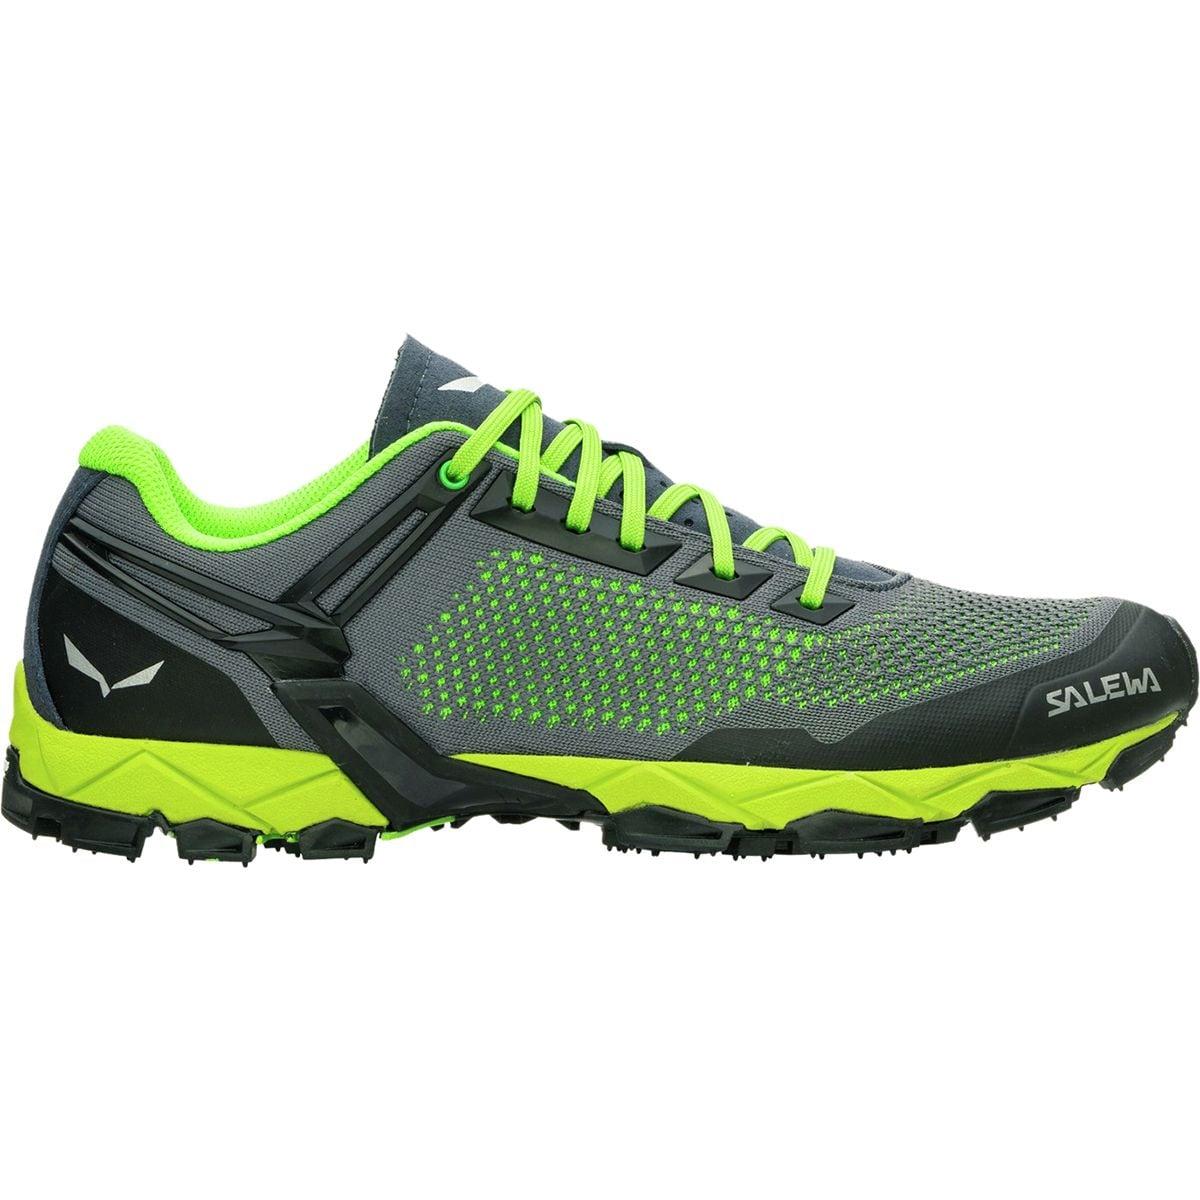 SALEWA MS LITE Train Quiet Shade Cactus Hiking Trail Shoes